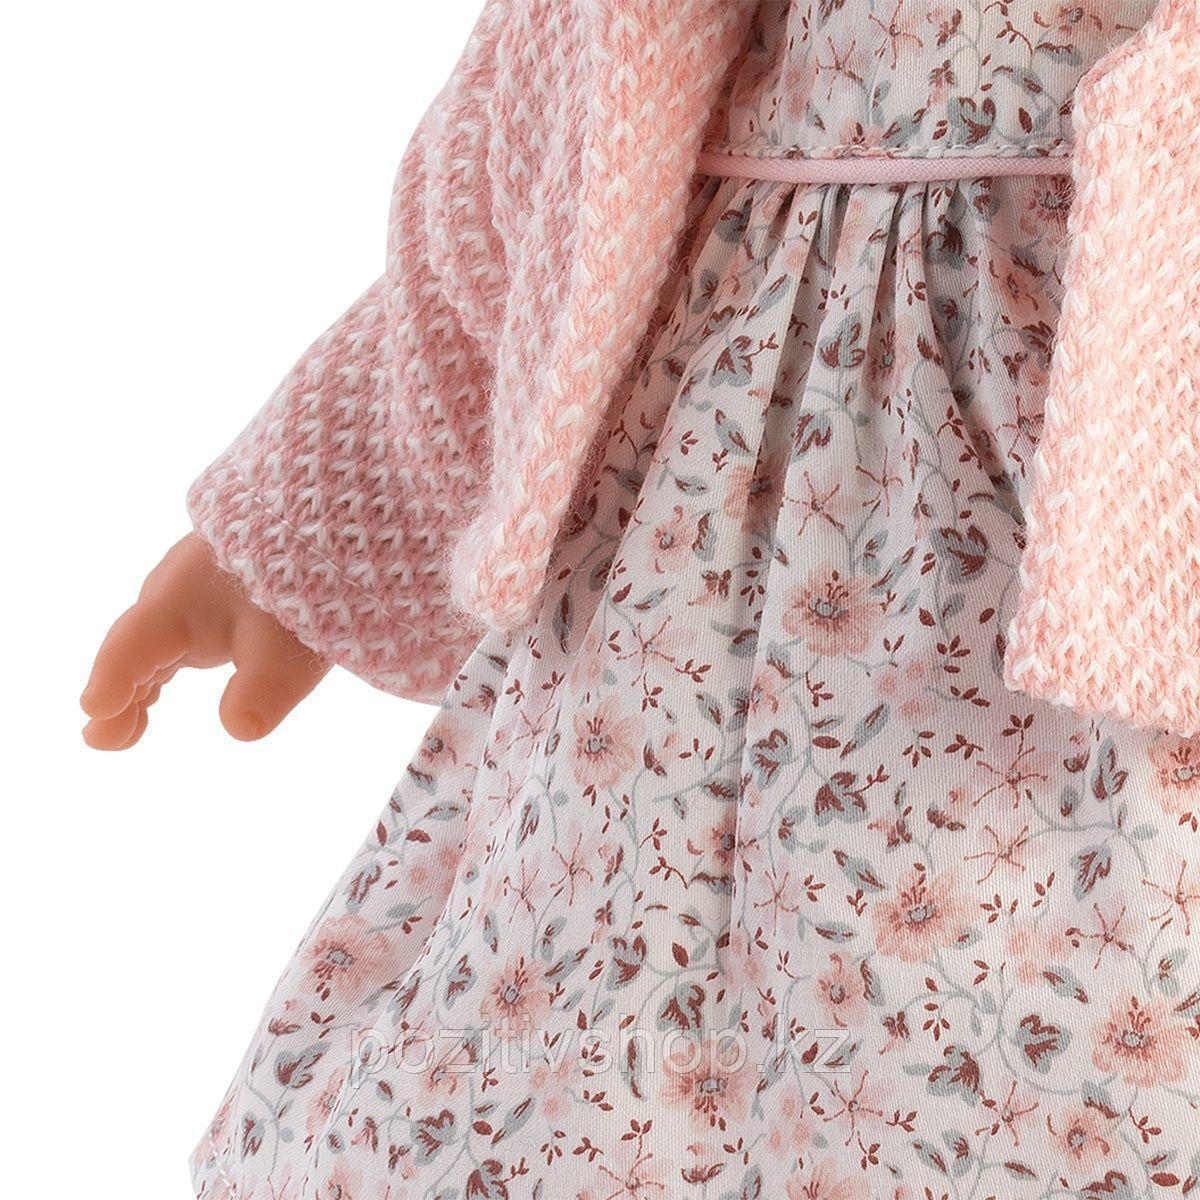 Кукла Llorens Роберта 33 см. блондинка в светло-розовом жакете - фото 4